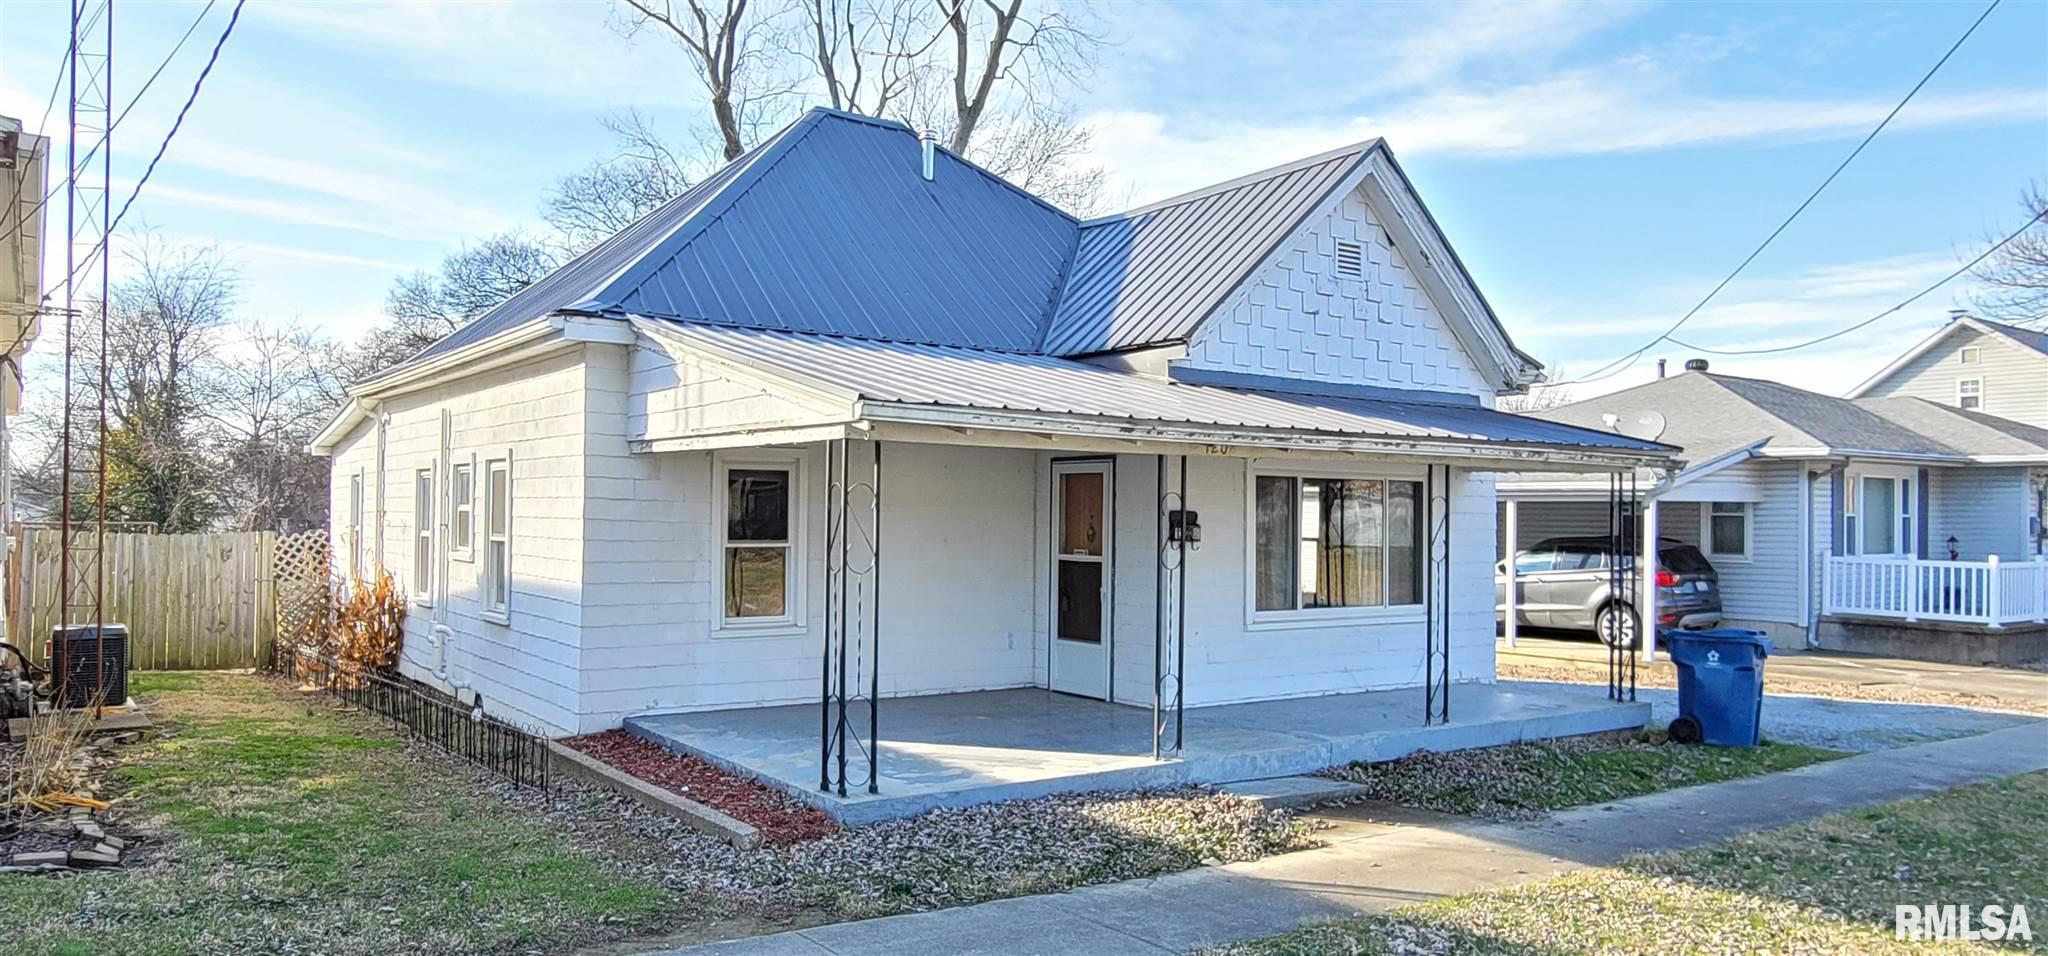 1208 N WALNUT Property Photo - Mt Carmel, IL real estate listing